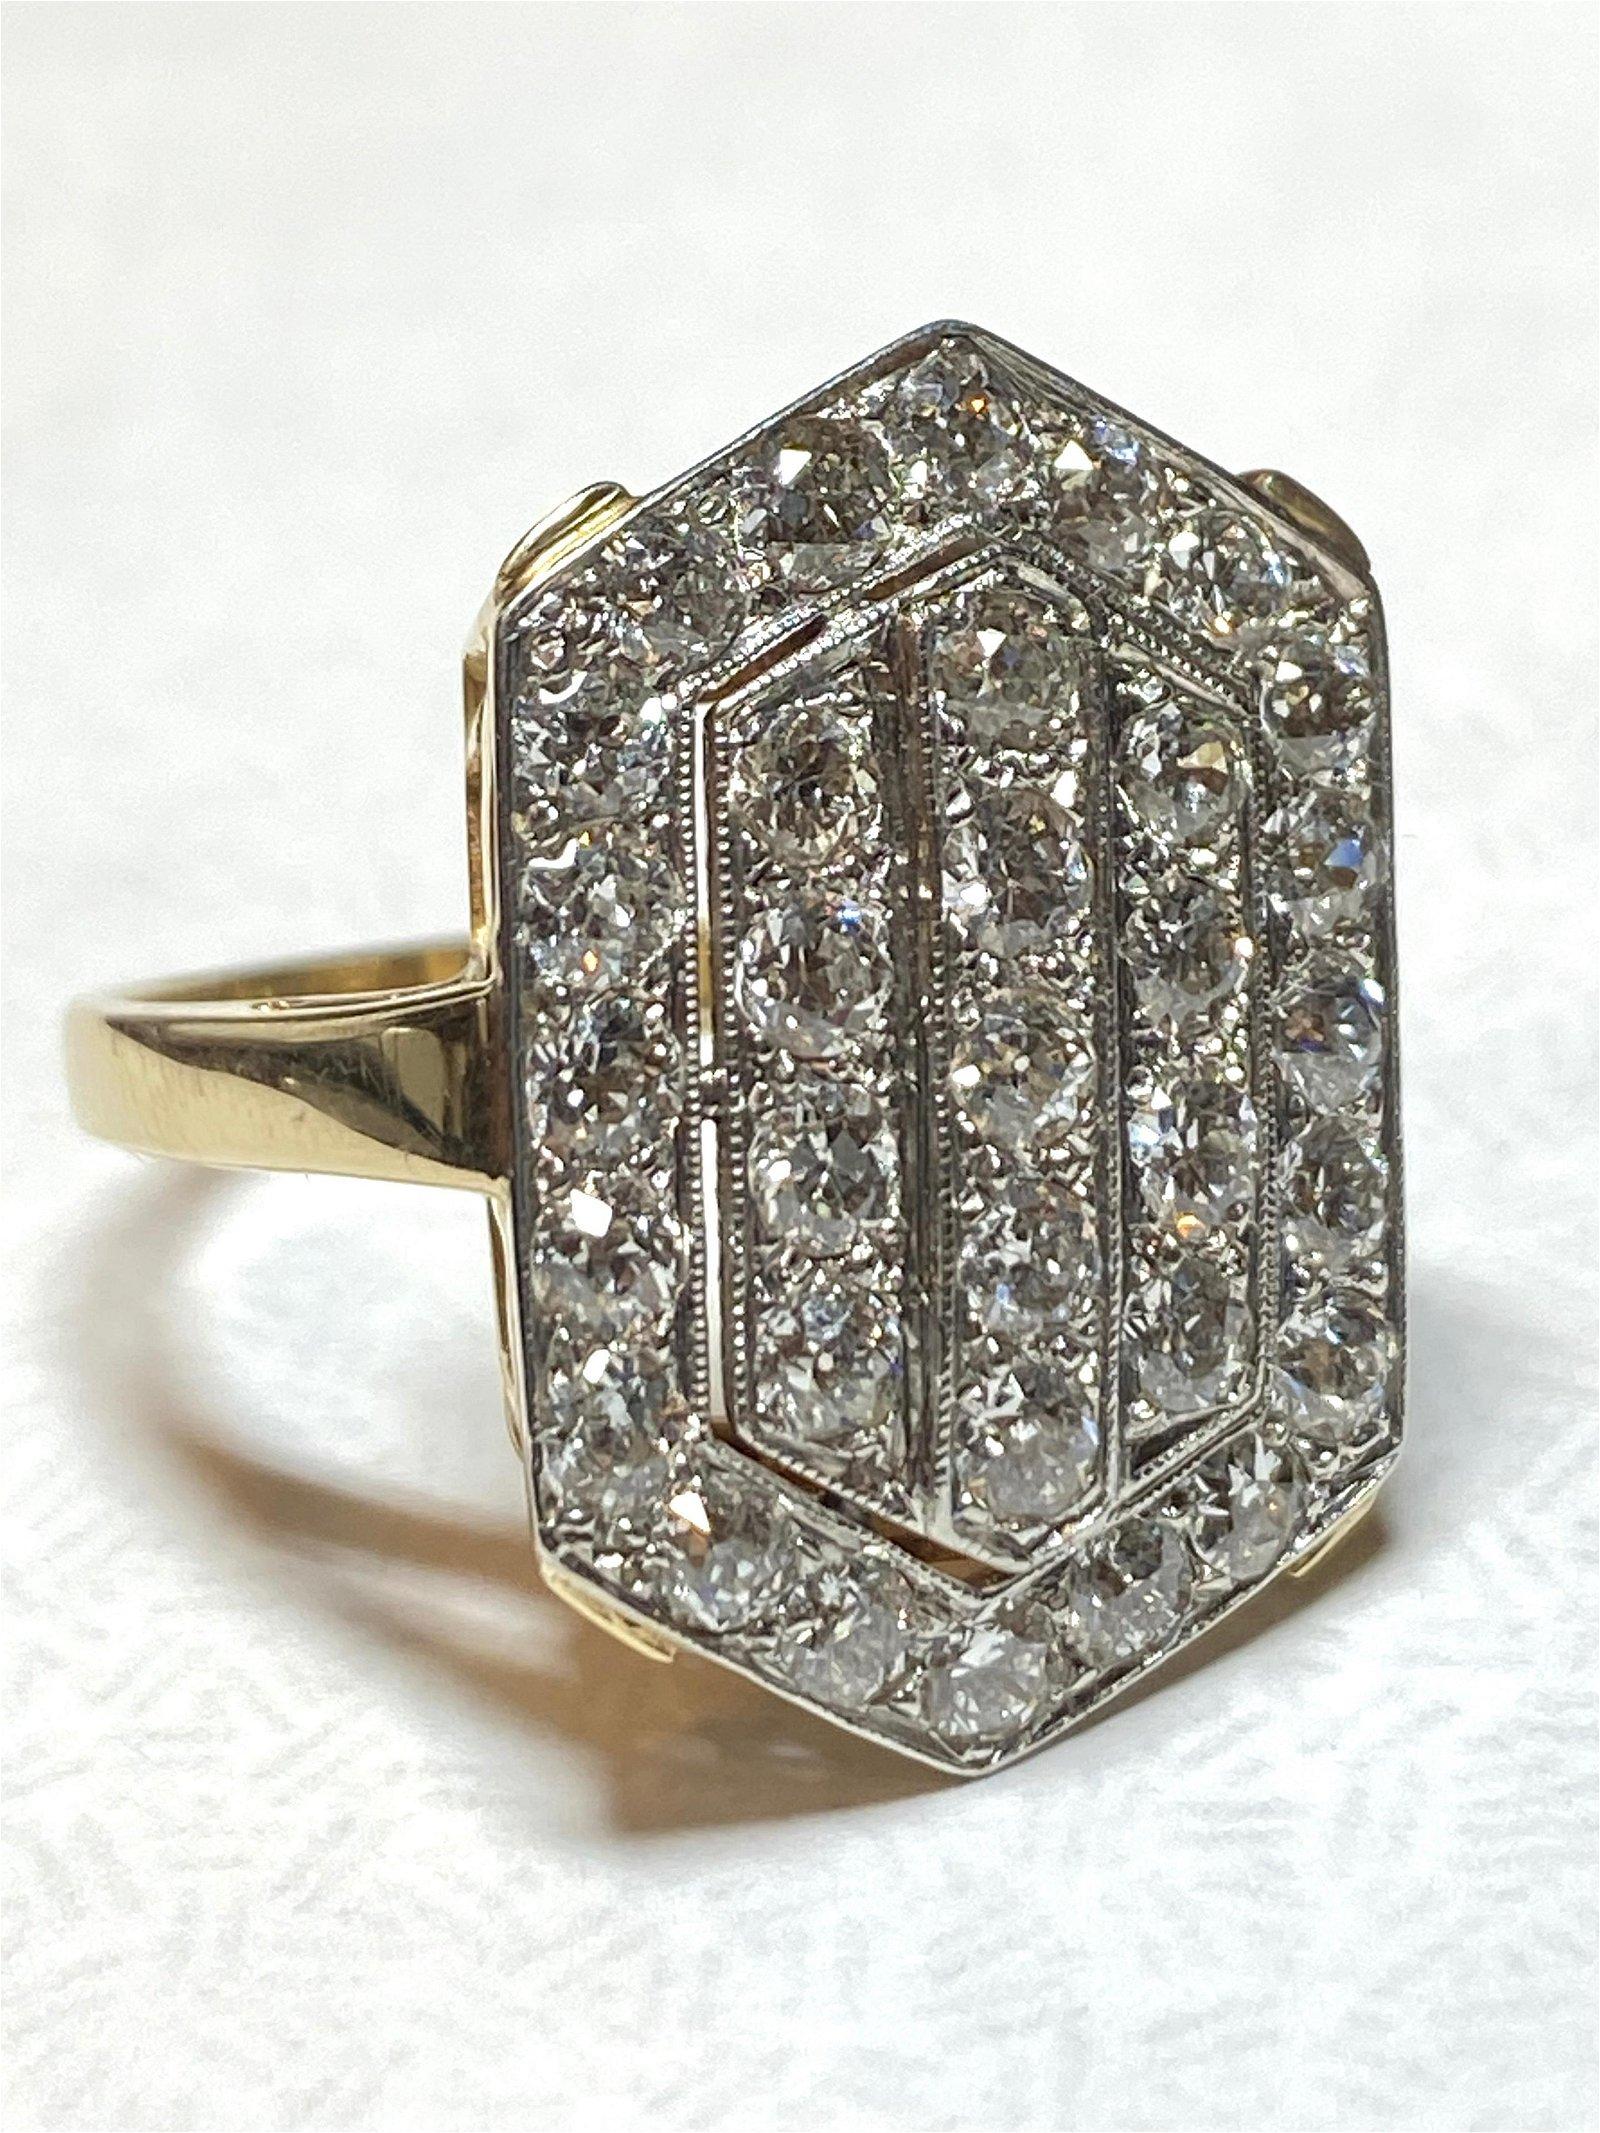 ART DECO 14K GOLD 2.50 TCW VS, G DIAMONDS COCKTAIL RING